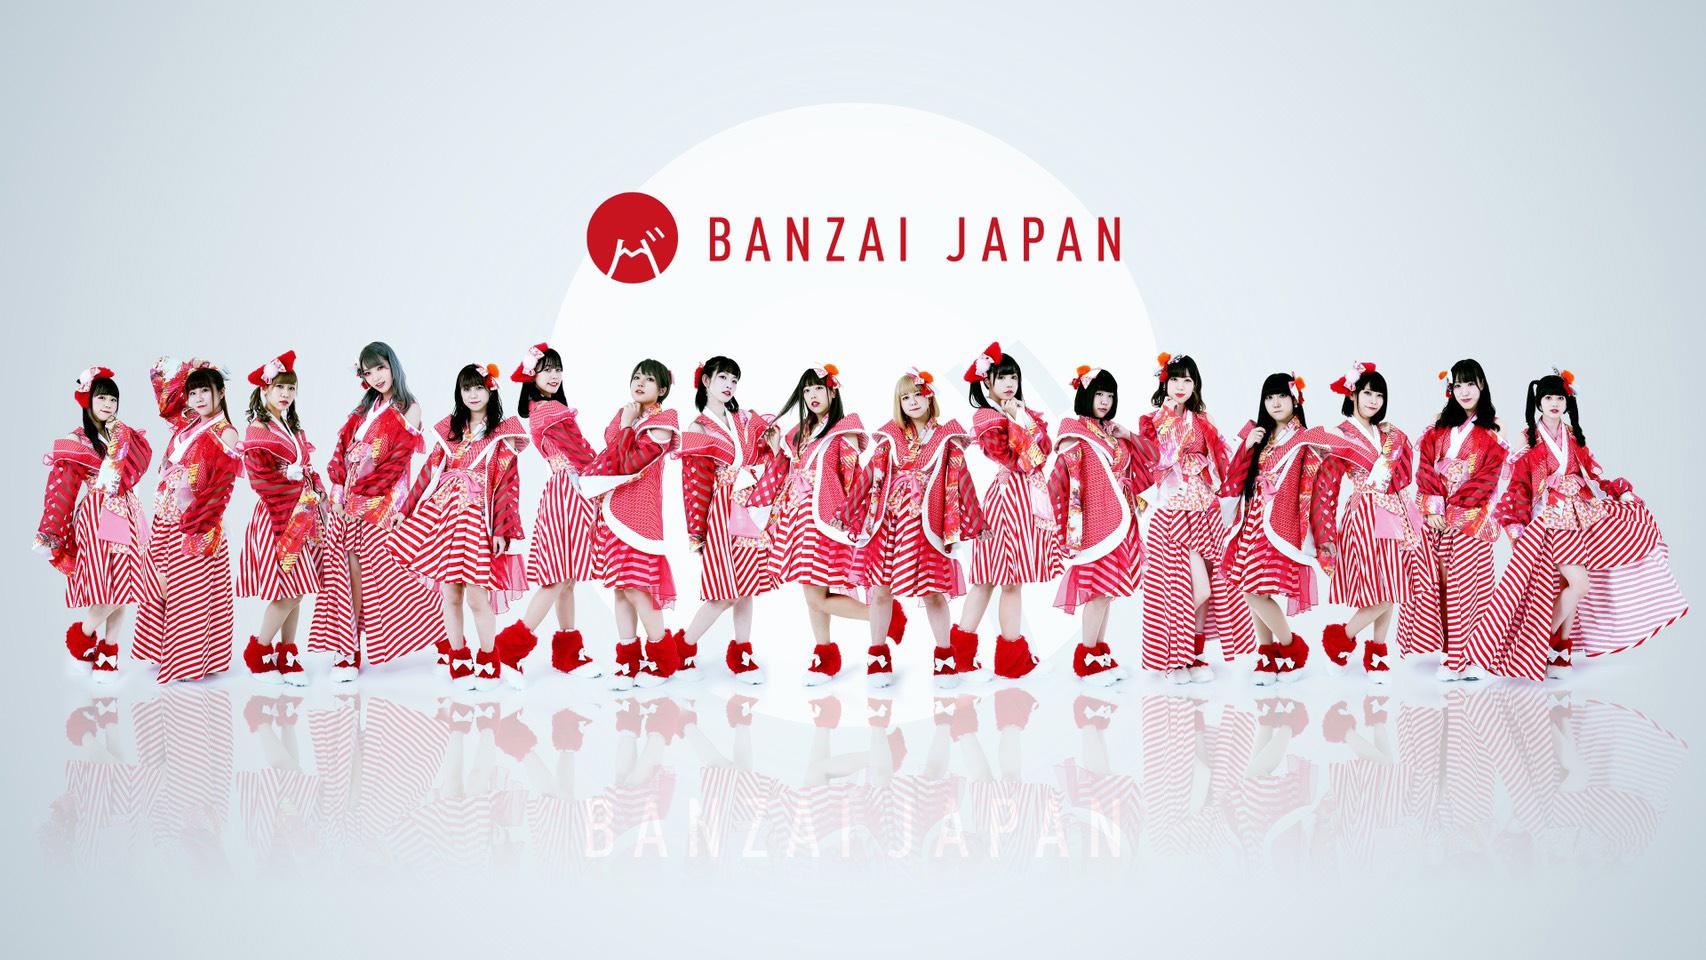 【振替公演】BANZAI JAPAN